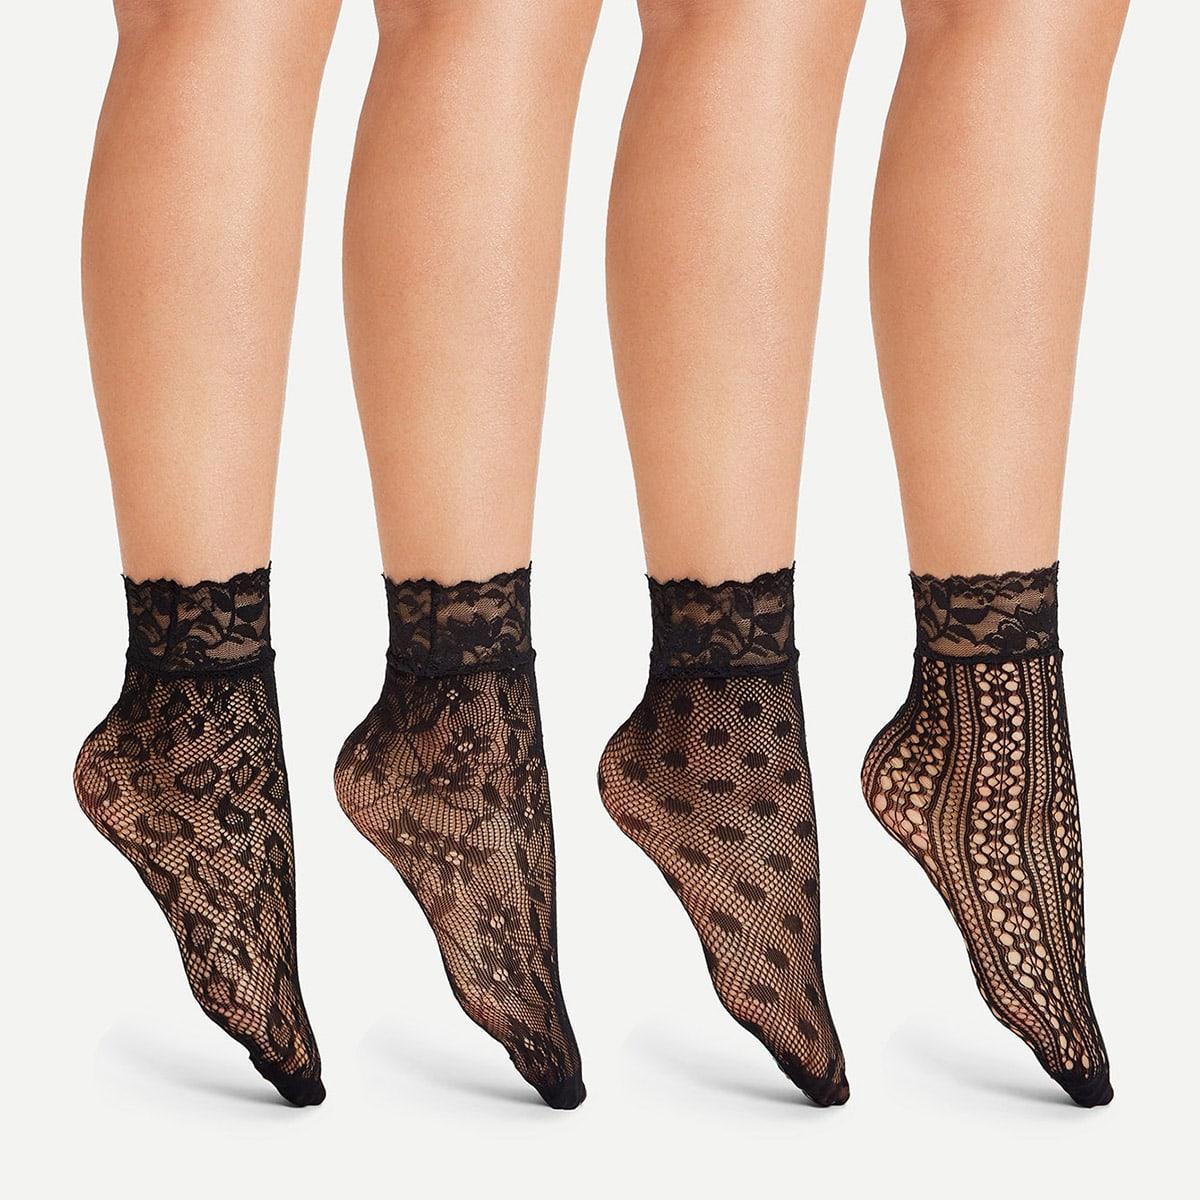 Lace Trim Net Socks 4pairs